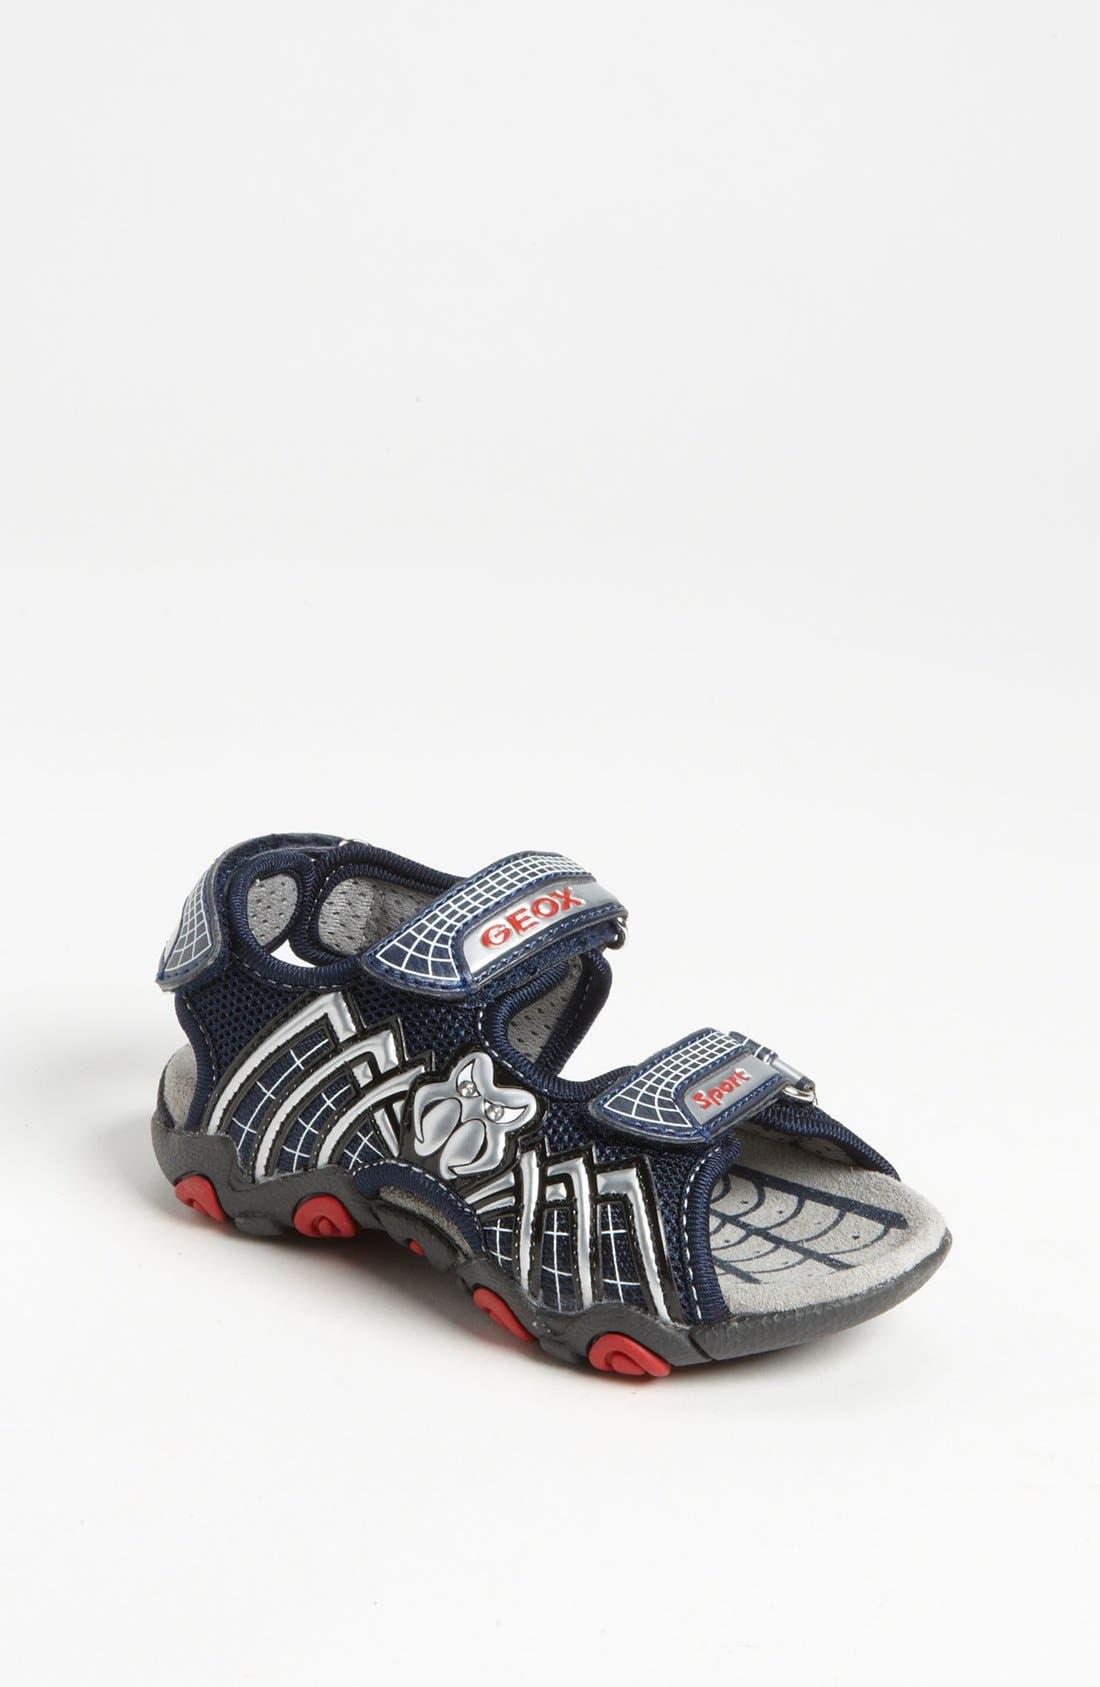 Alternate Image 1 Selected - Geox 'Strike' Sandal (Toddler)